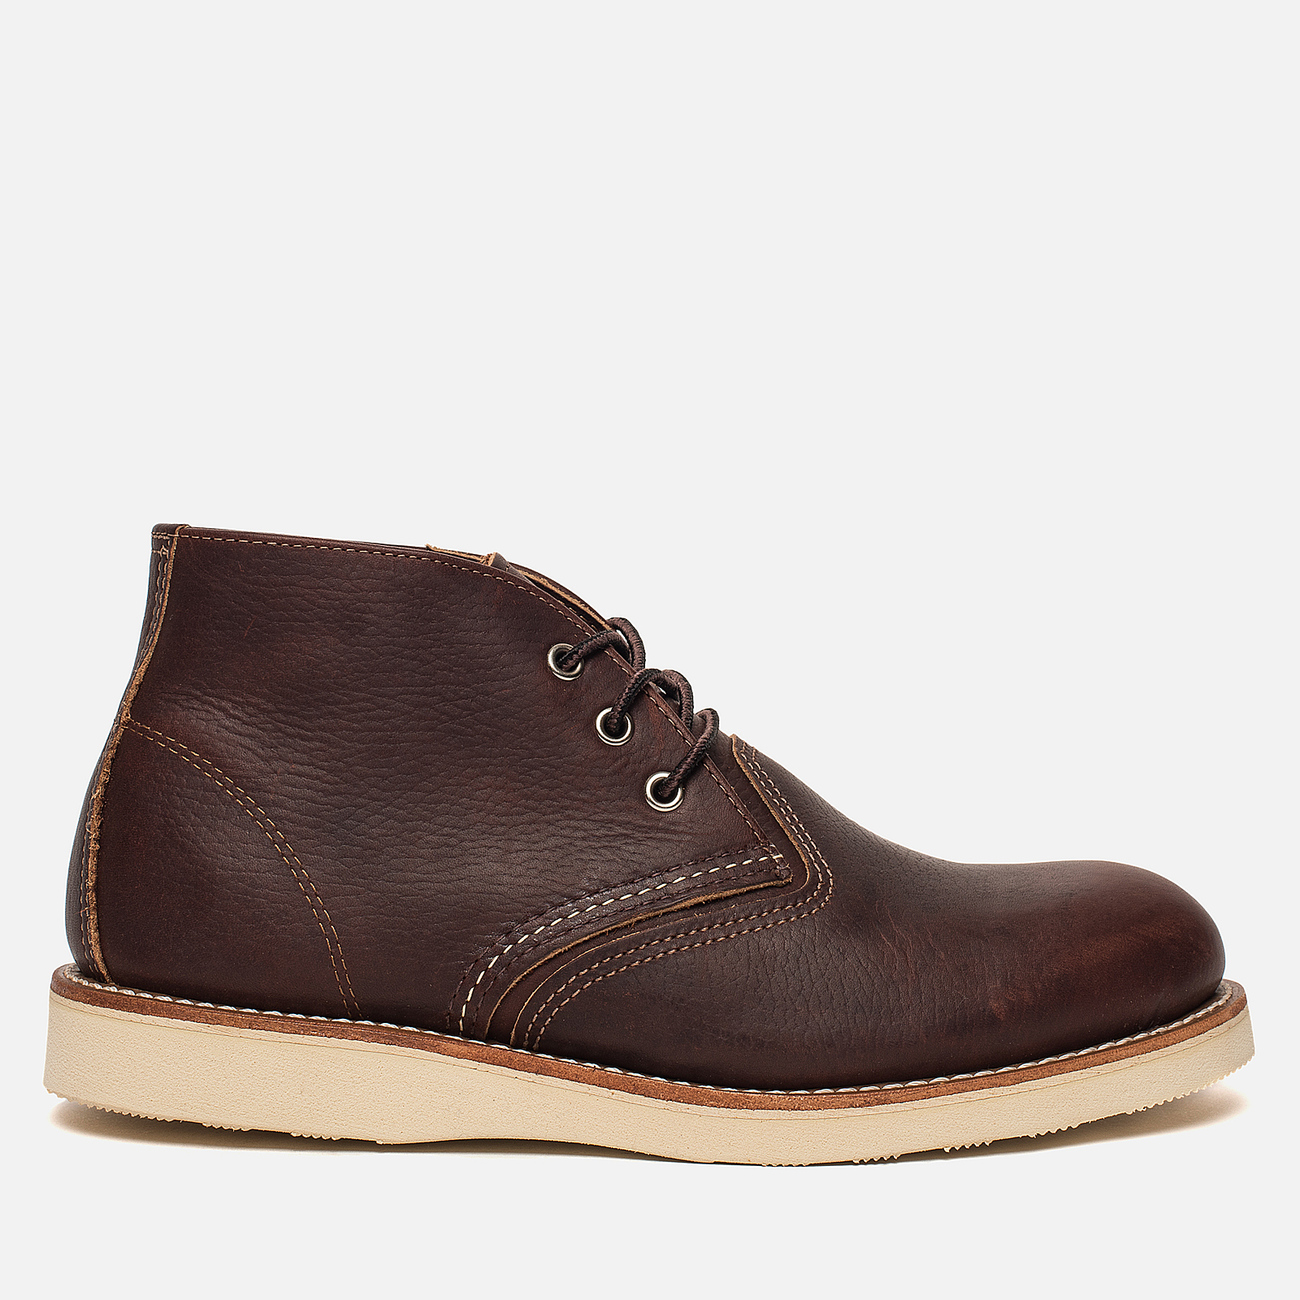 Мужские ботинки Red Wing Shoes 3141 Classic Chukka Leather Briar Oil Slick